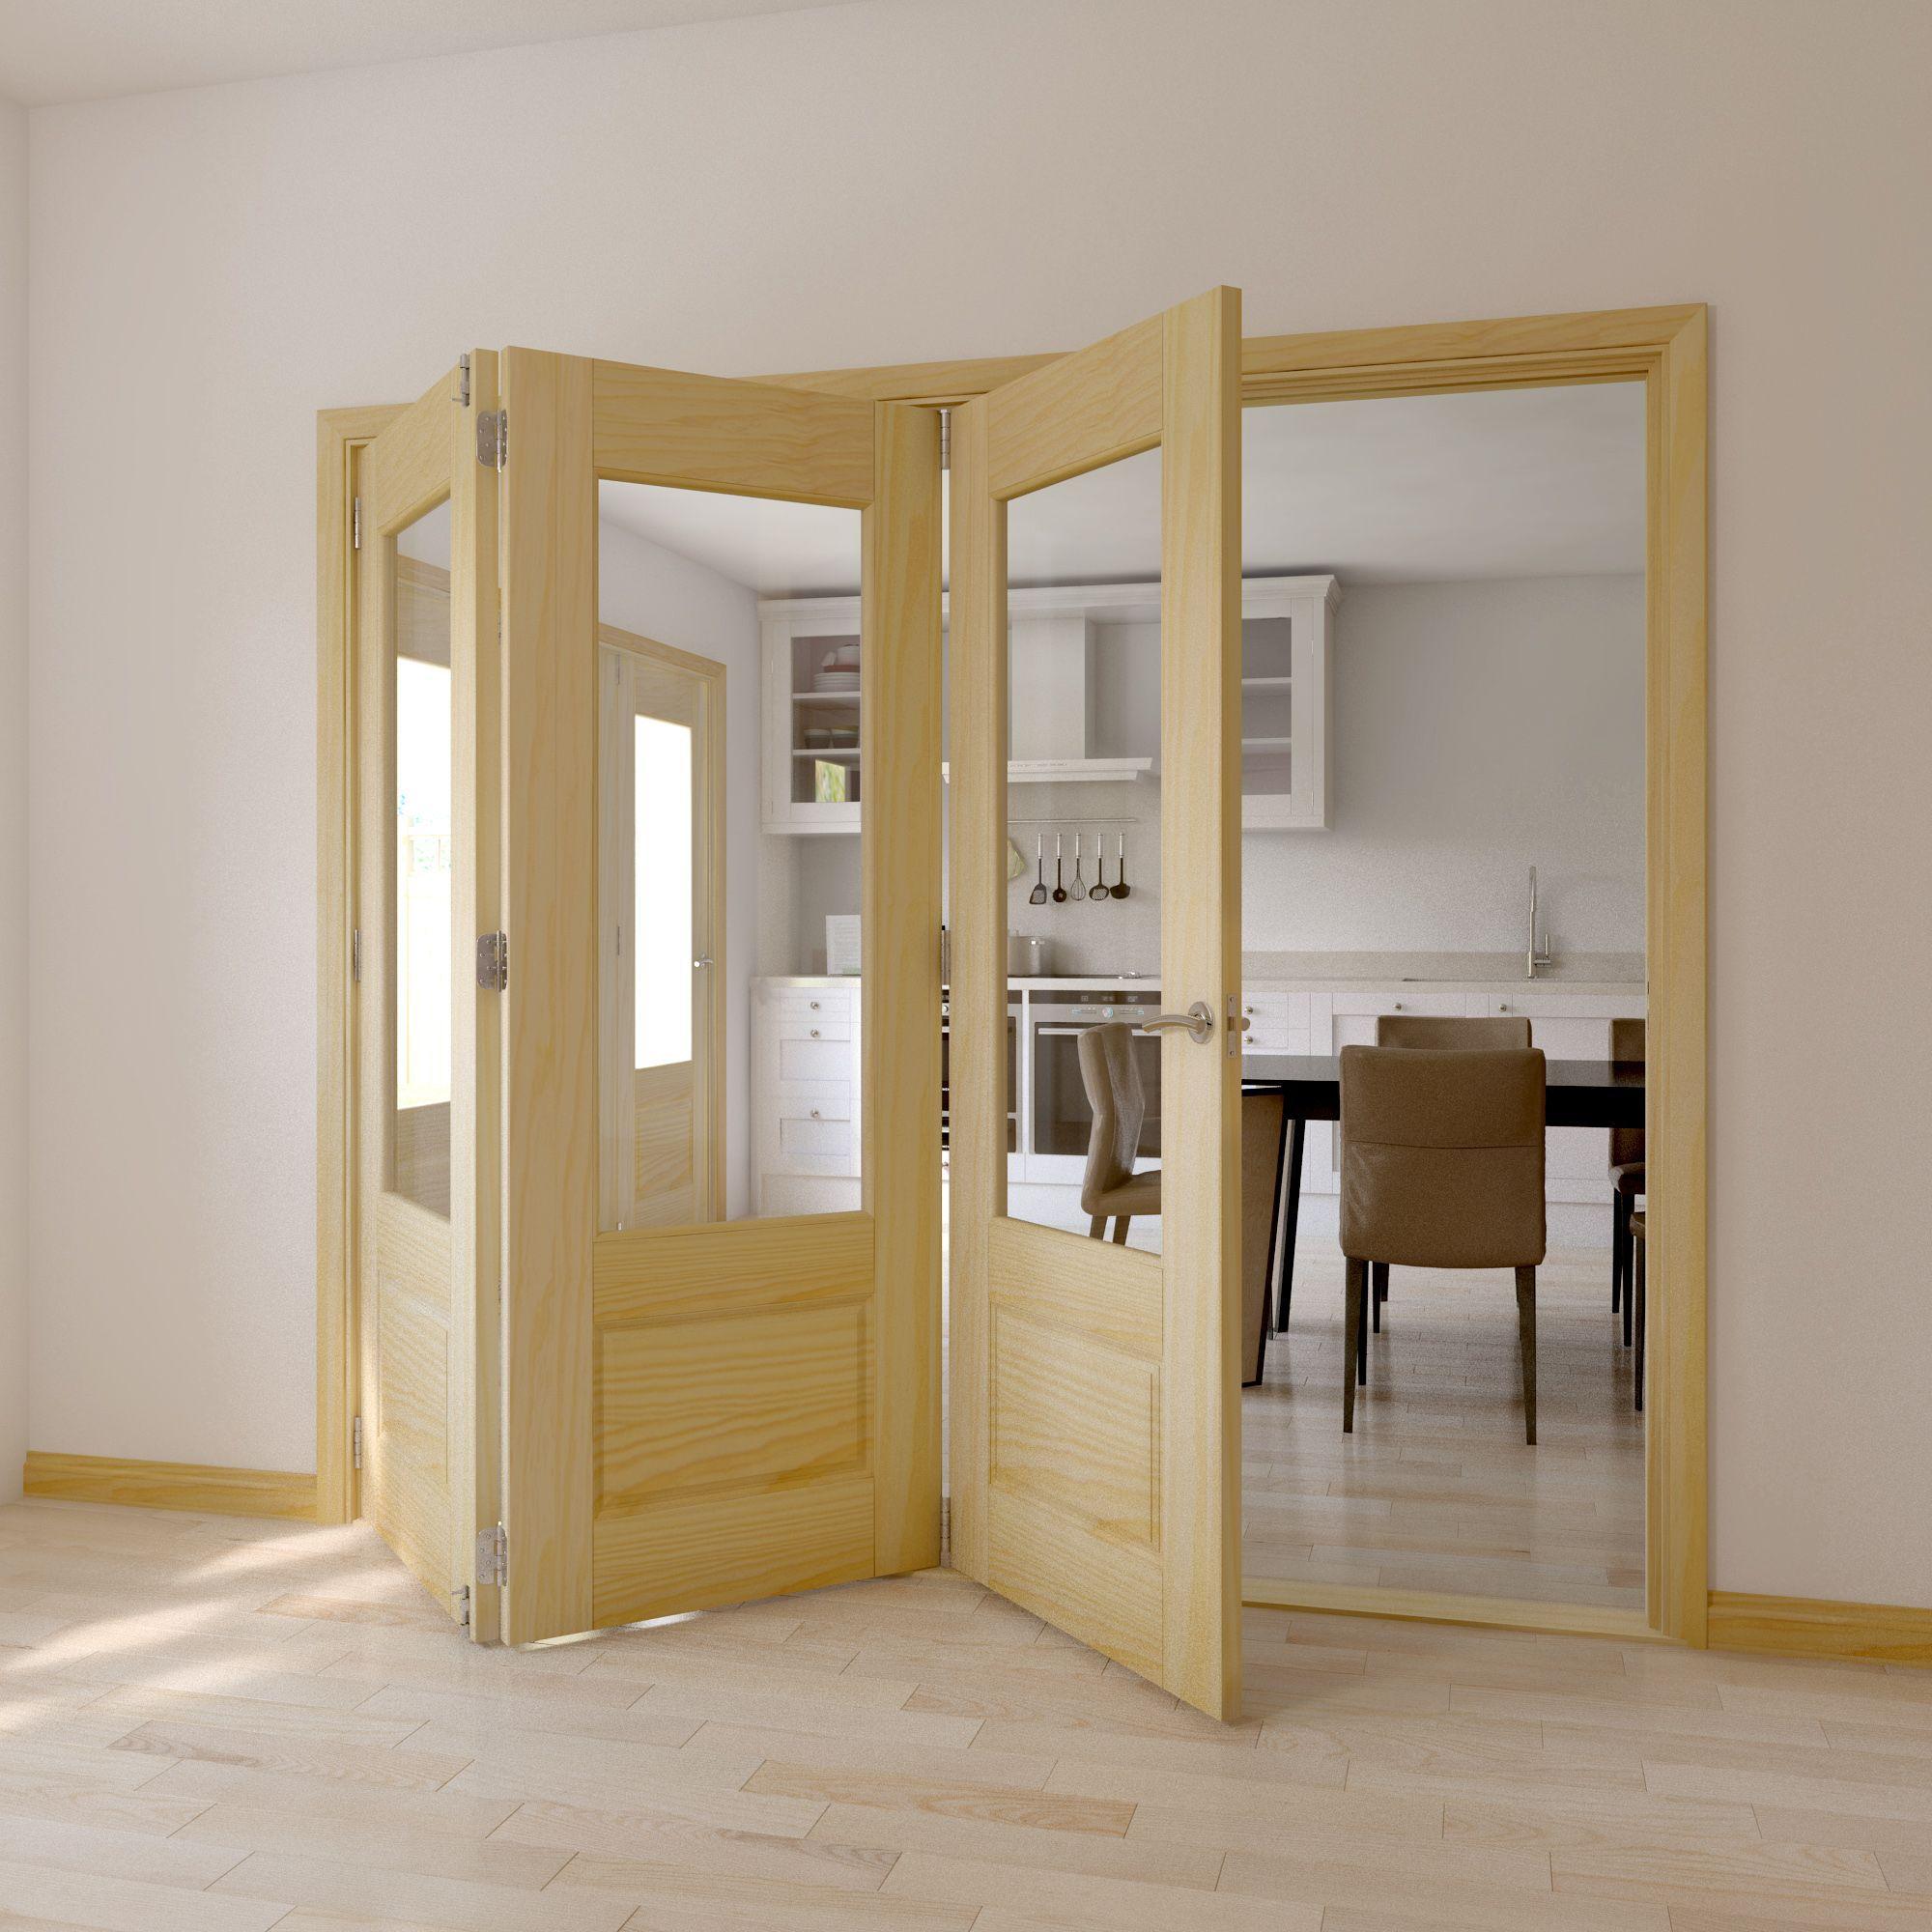 Severn 2 Panel Clear Pine Glazed Internal Folding Door Lh H2035mm